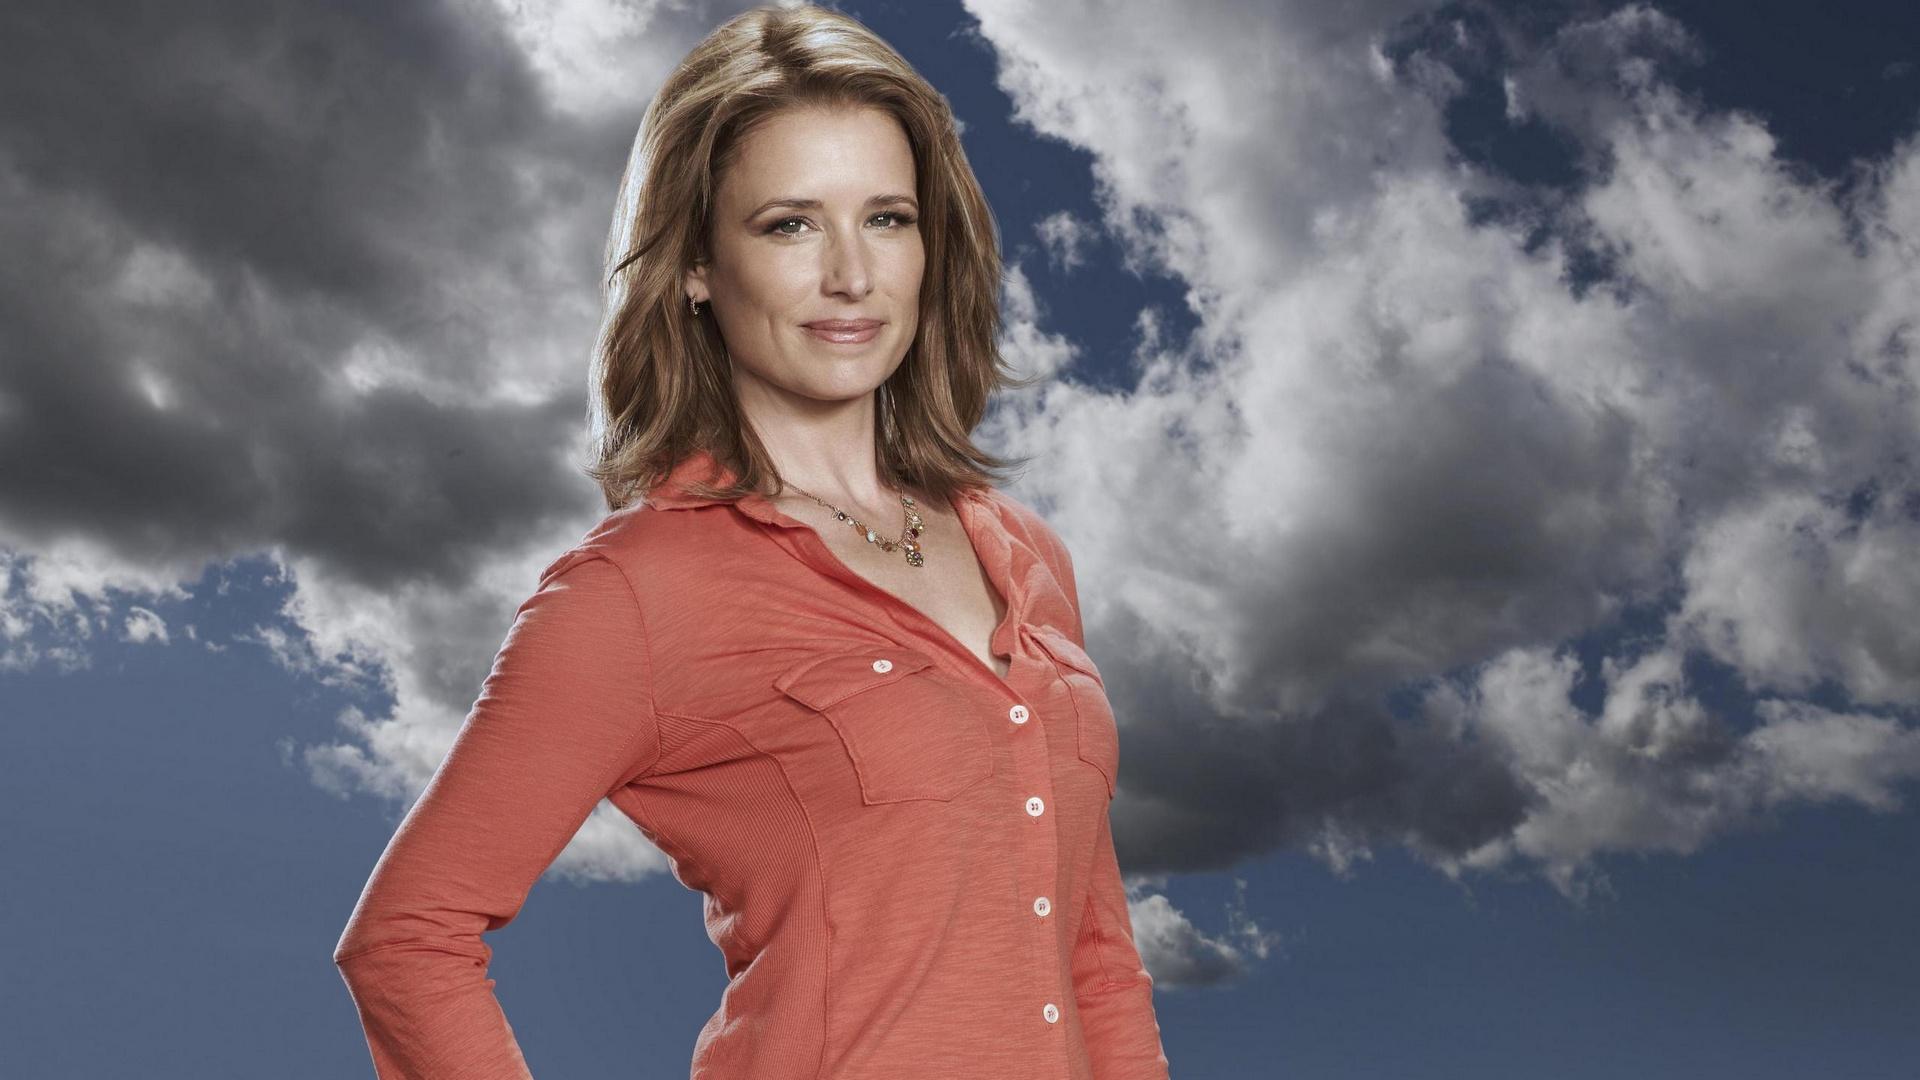 Wallpaper Anger Management TV show, Shawnee Smith, blonde, actress